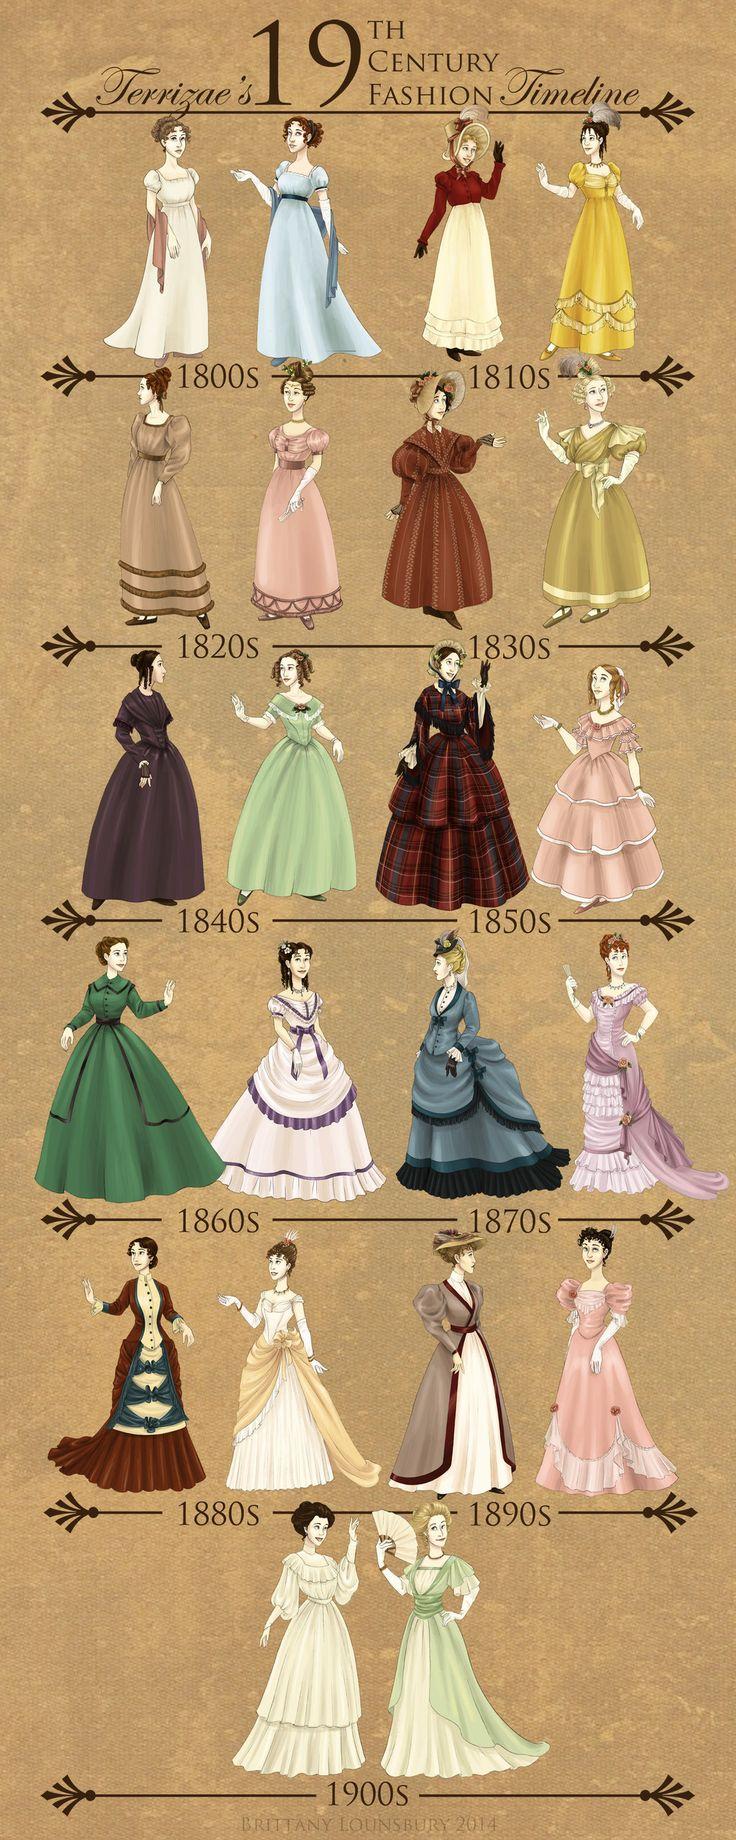 19th Century Fashion Timeline by Terrizae on deviantART